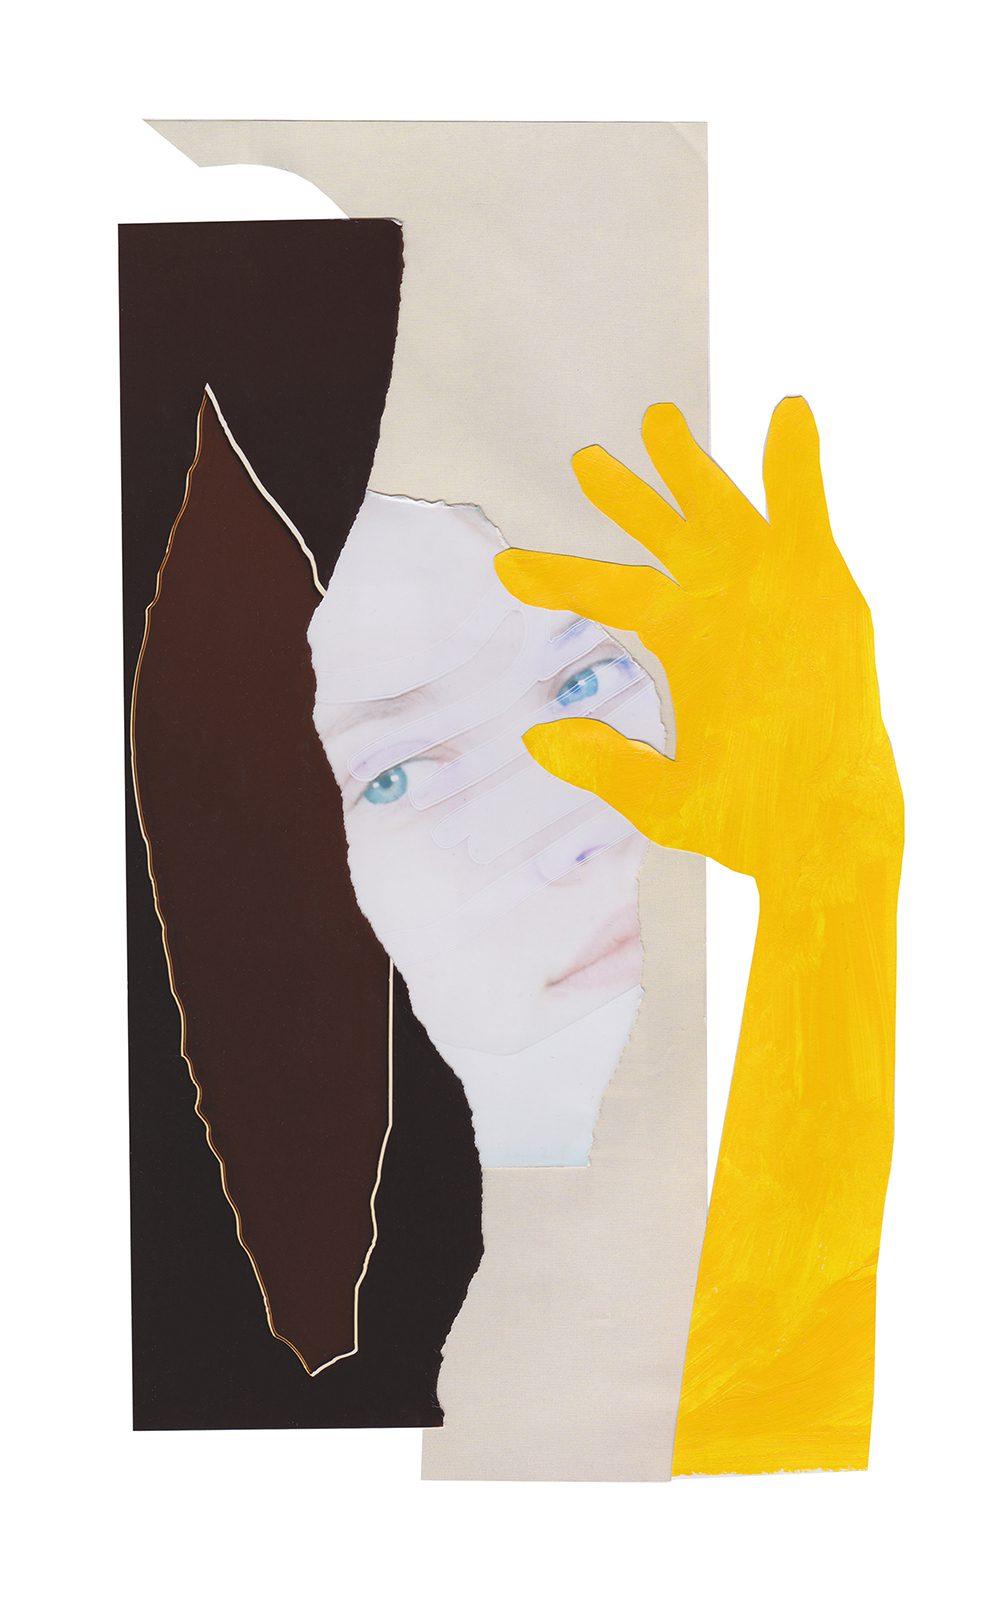 Georgia Clemson, I Spy, 2020. 50 x 80cm. Edition 3 & 2Aps. Courtesy of Arte Globale.